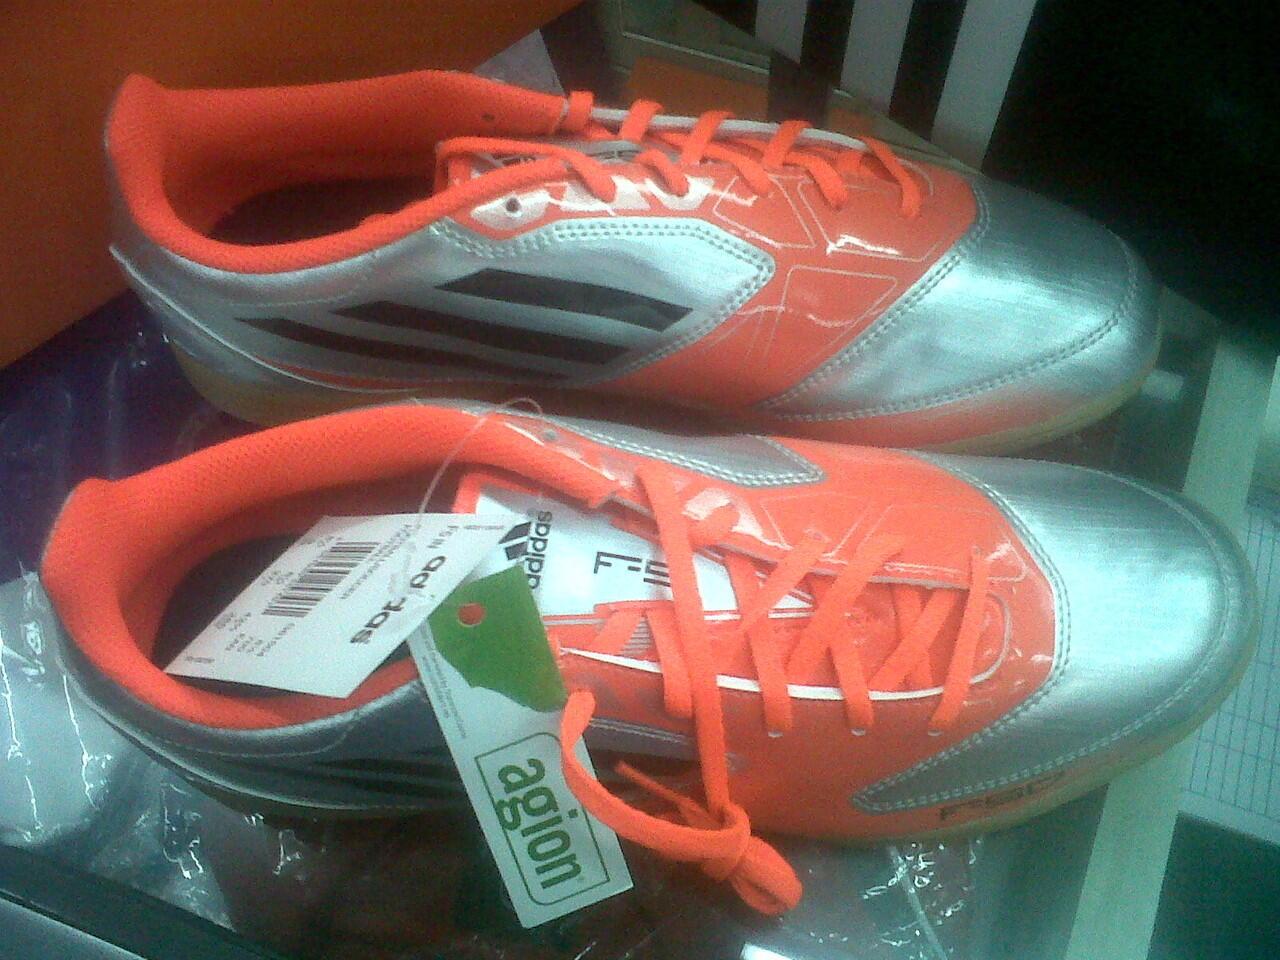 Jual sepatu futsal Adidas F5 micoach messi 2012-2013 silver orange 100% Original